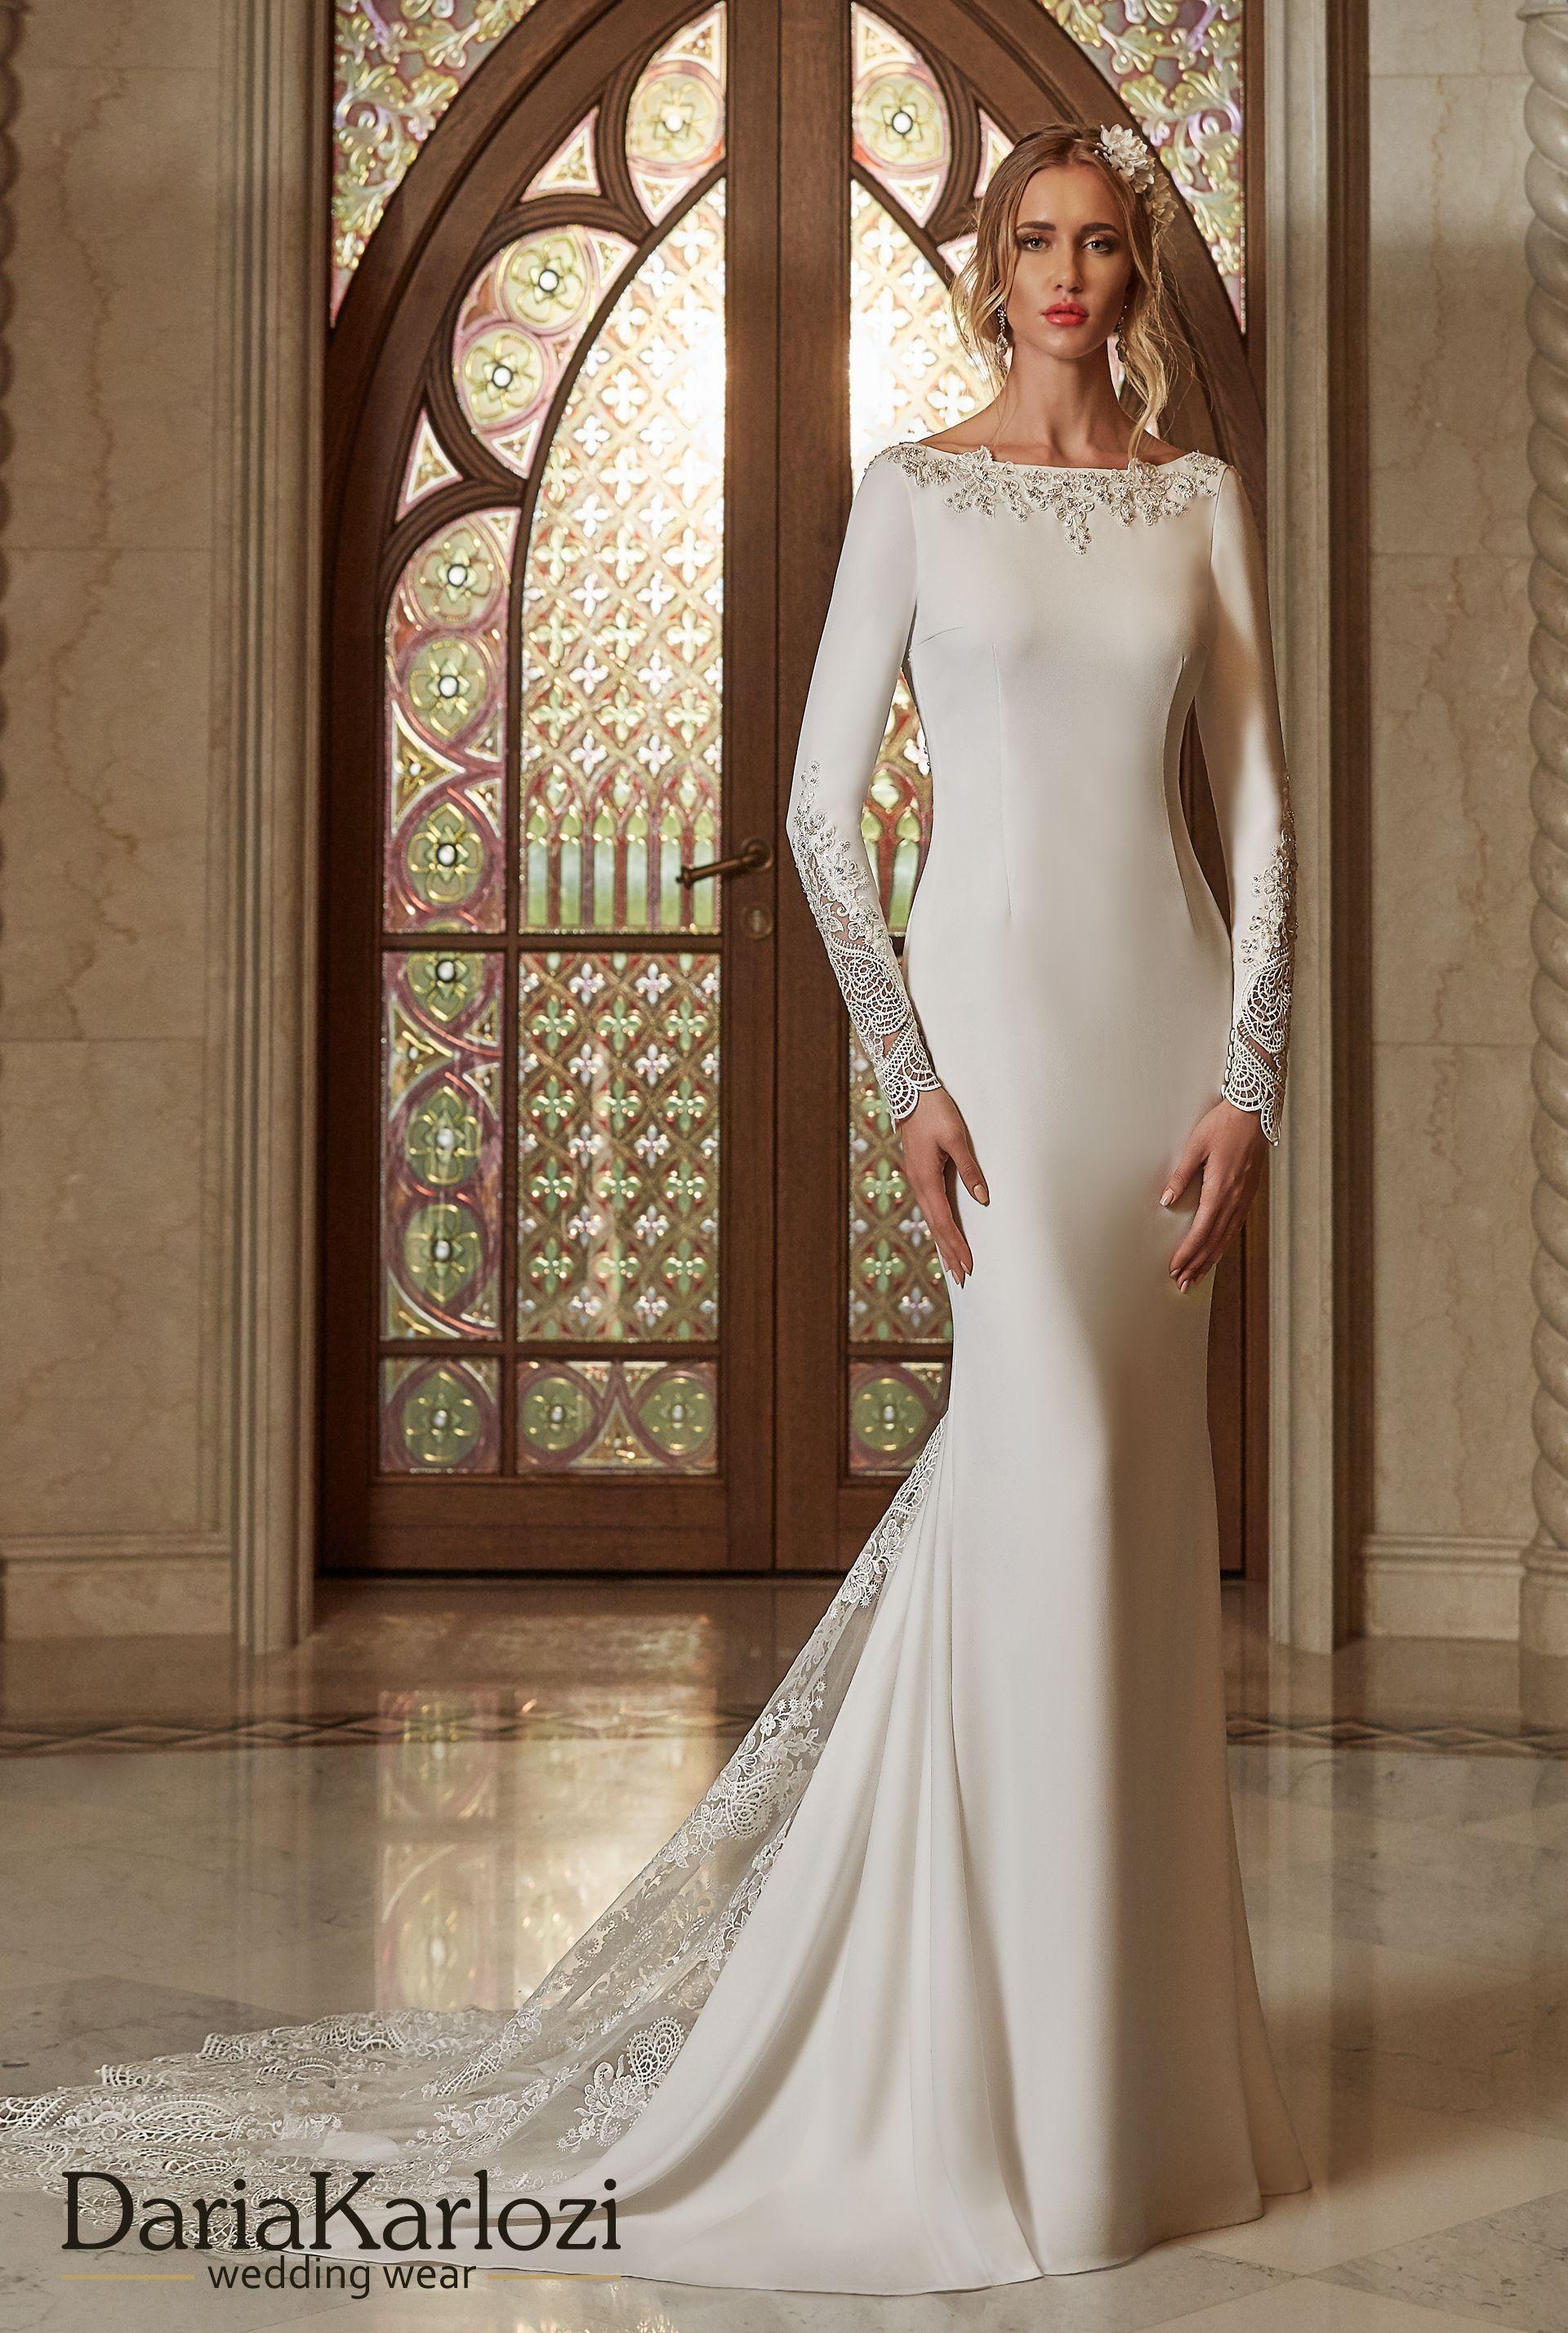 Labridal bela bridal pinterest wedding dress and